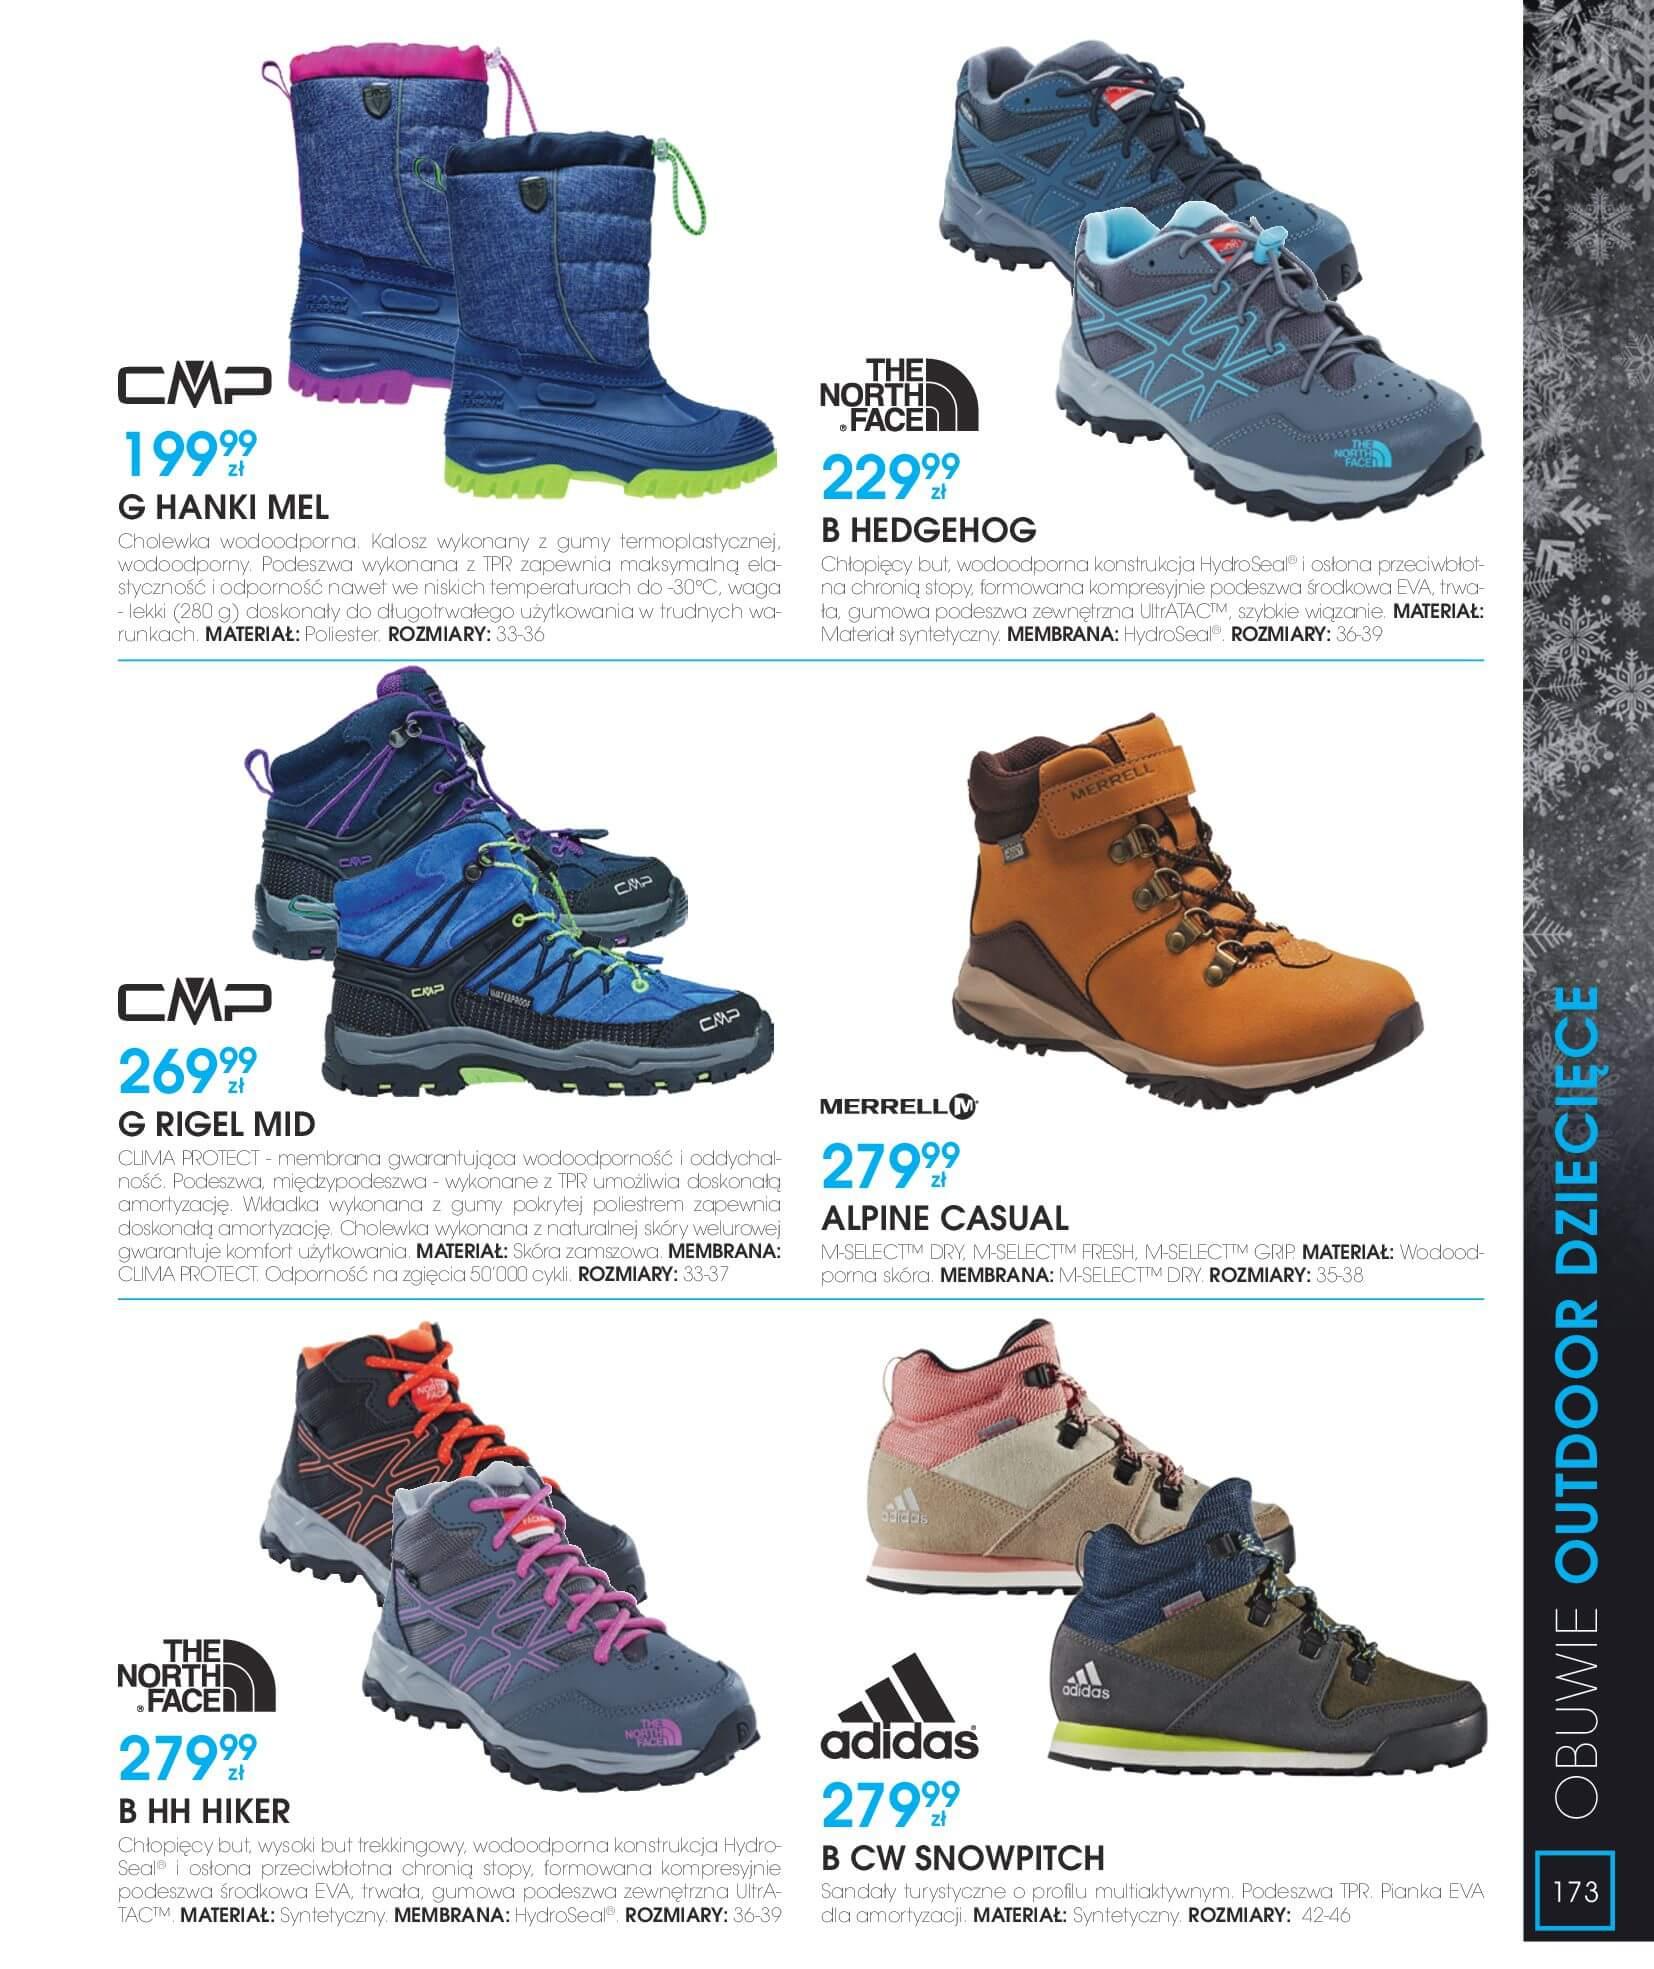 Gazetka Go Sport - Katalog Zima 2017/2018-12.11.2017-28.02.2018-page-173